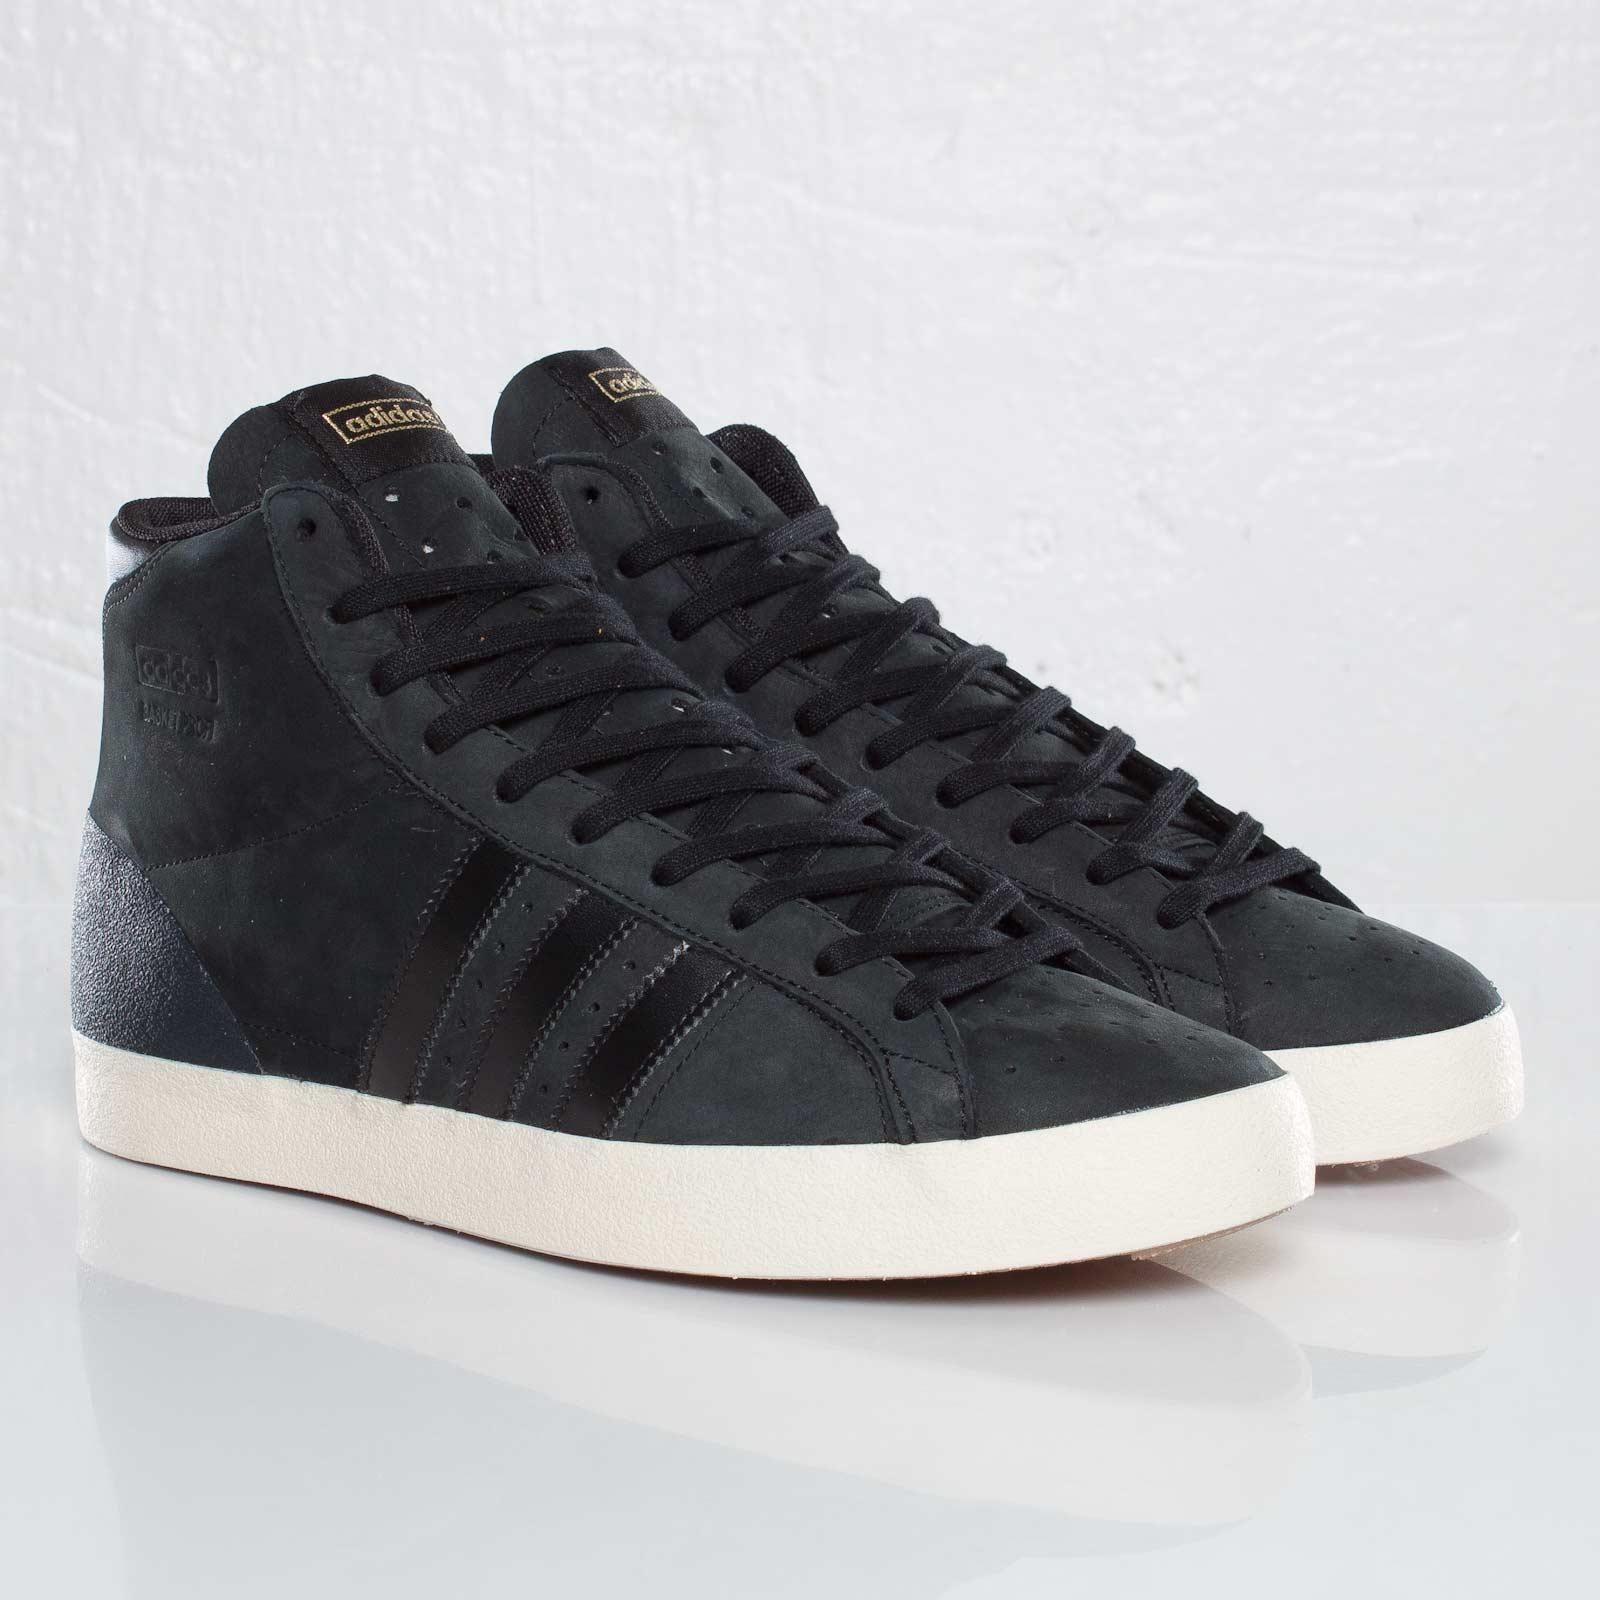 adidas Basket Profi OG G60895 Sneakersnstuff I Sneakers